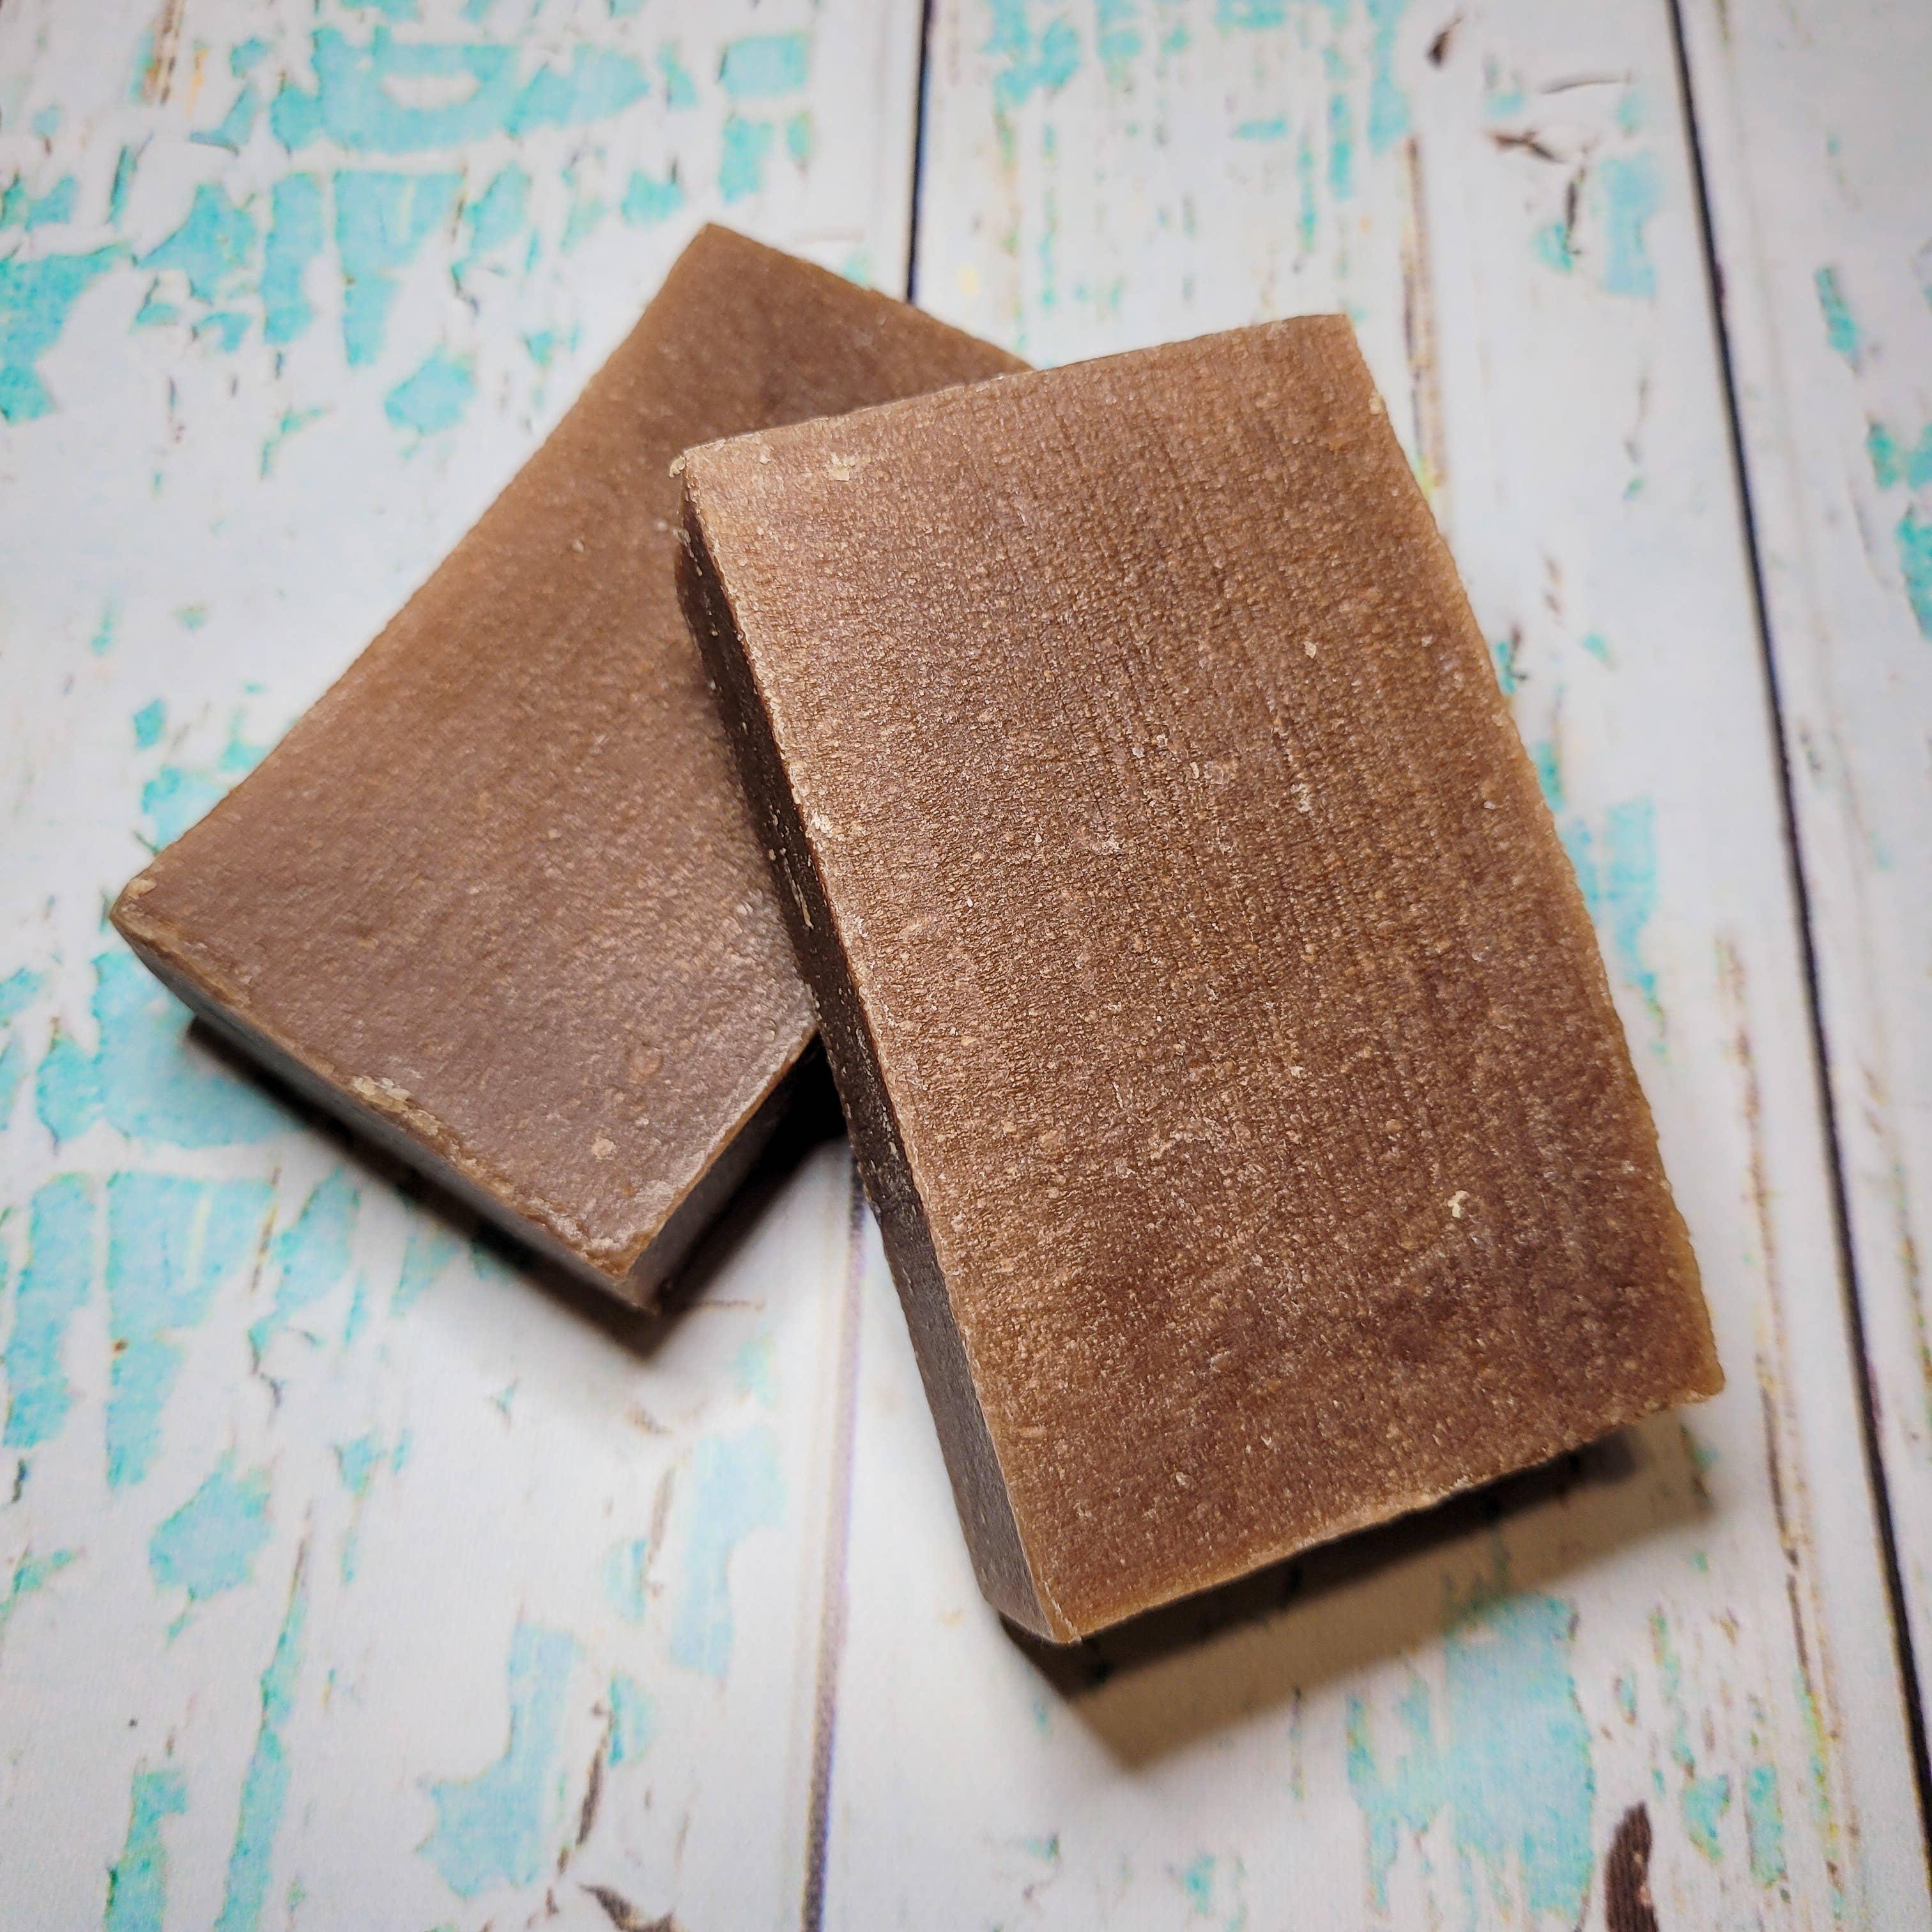 Evolve - Standard Soap - Vanilla Bean (Goatmilk) | Trada Marketplace